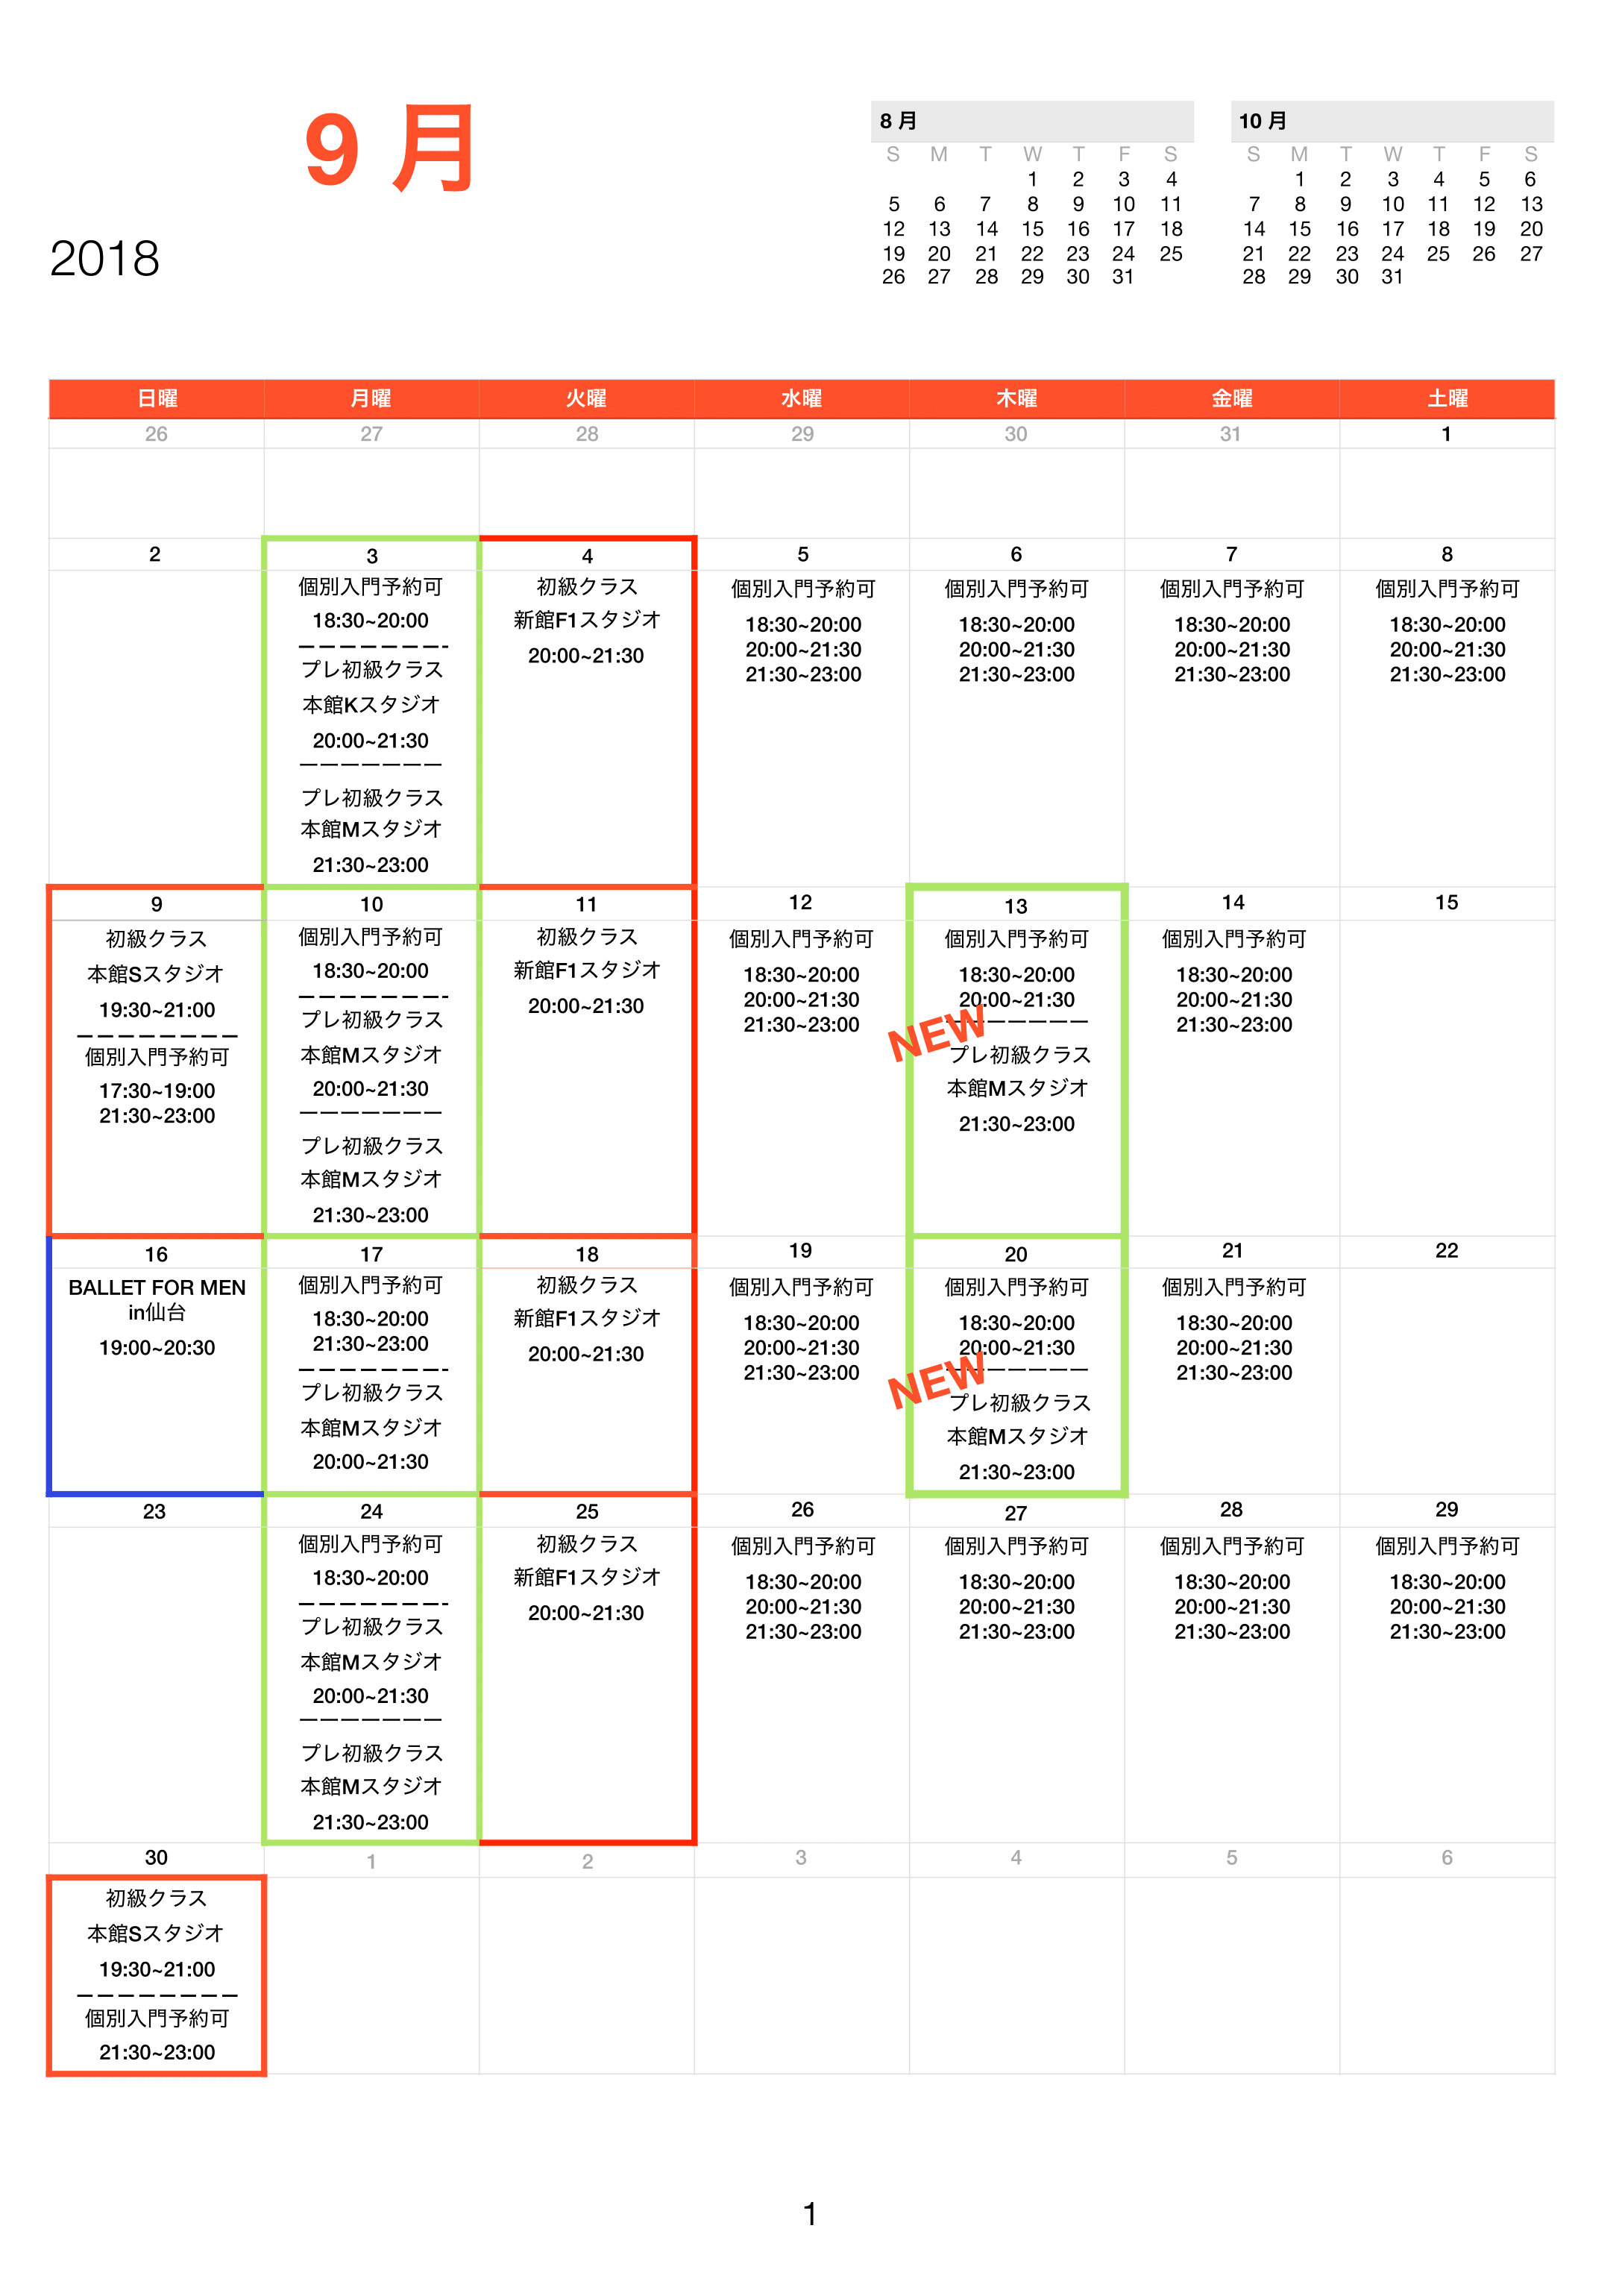 BFMスケジュール201809kai-1